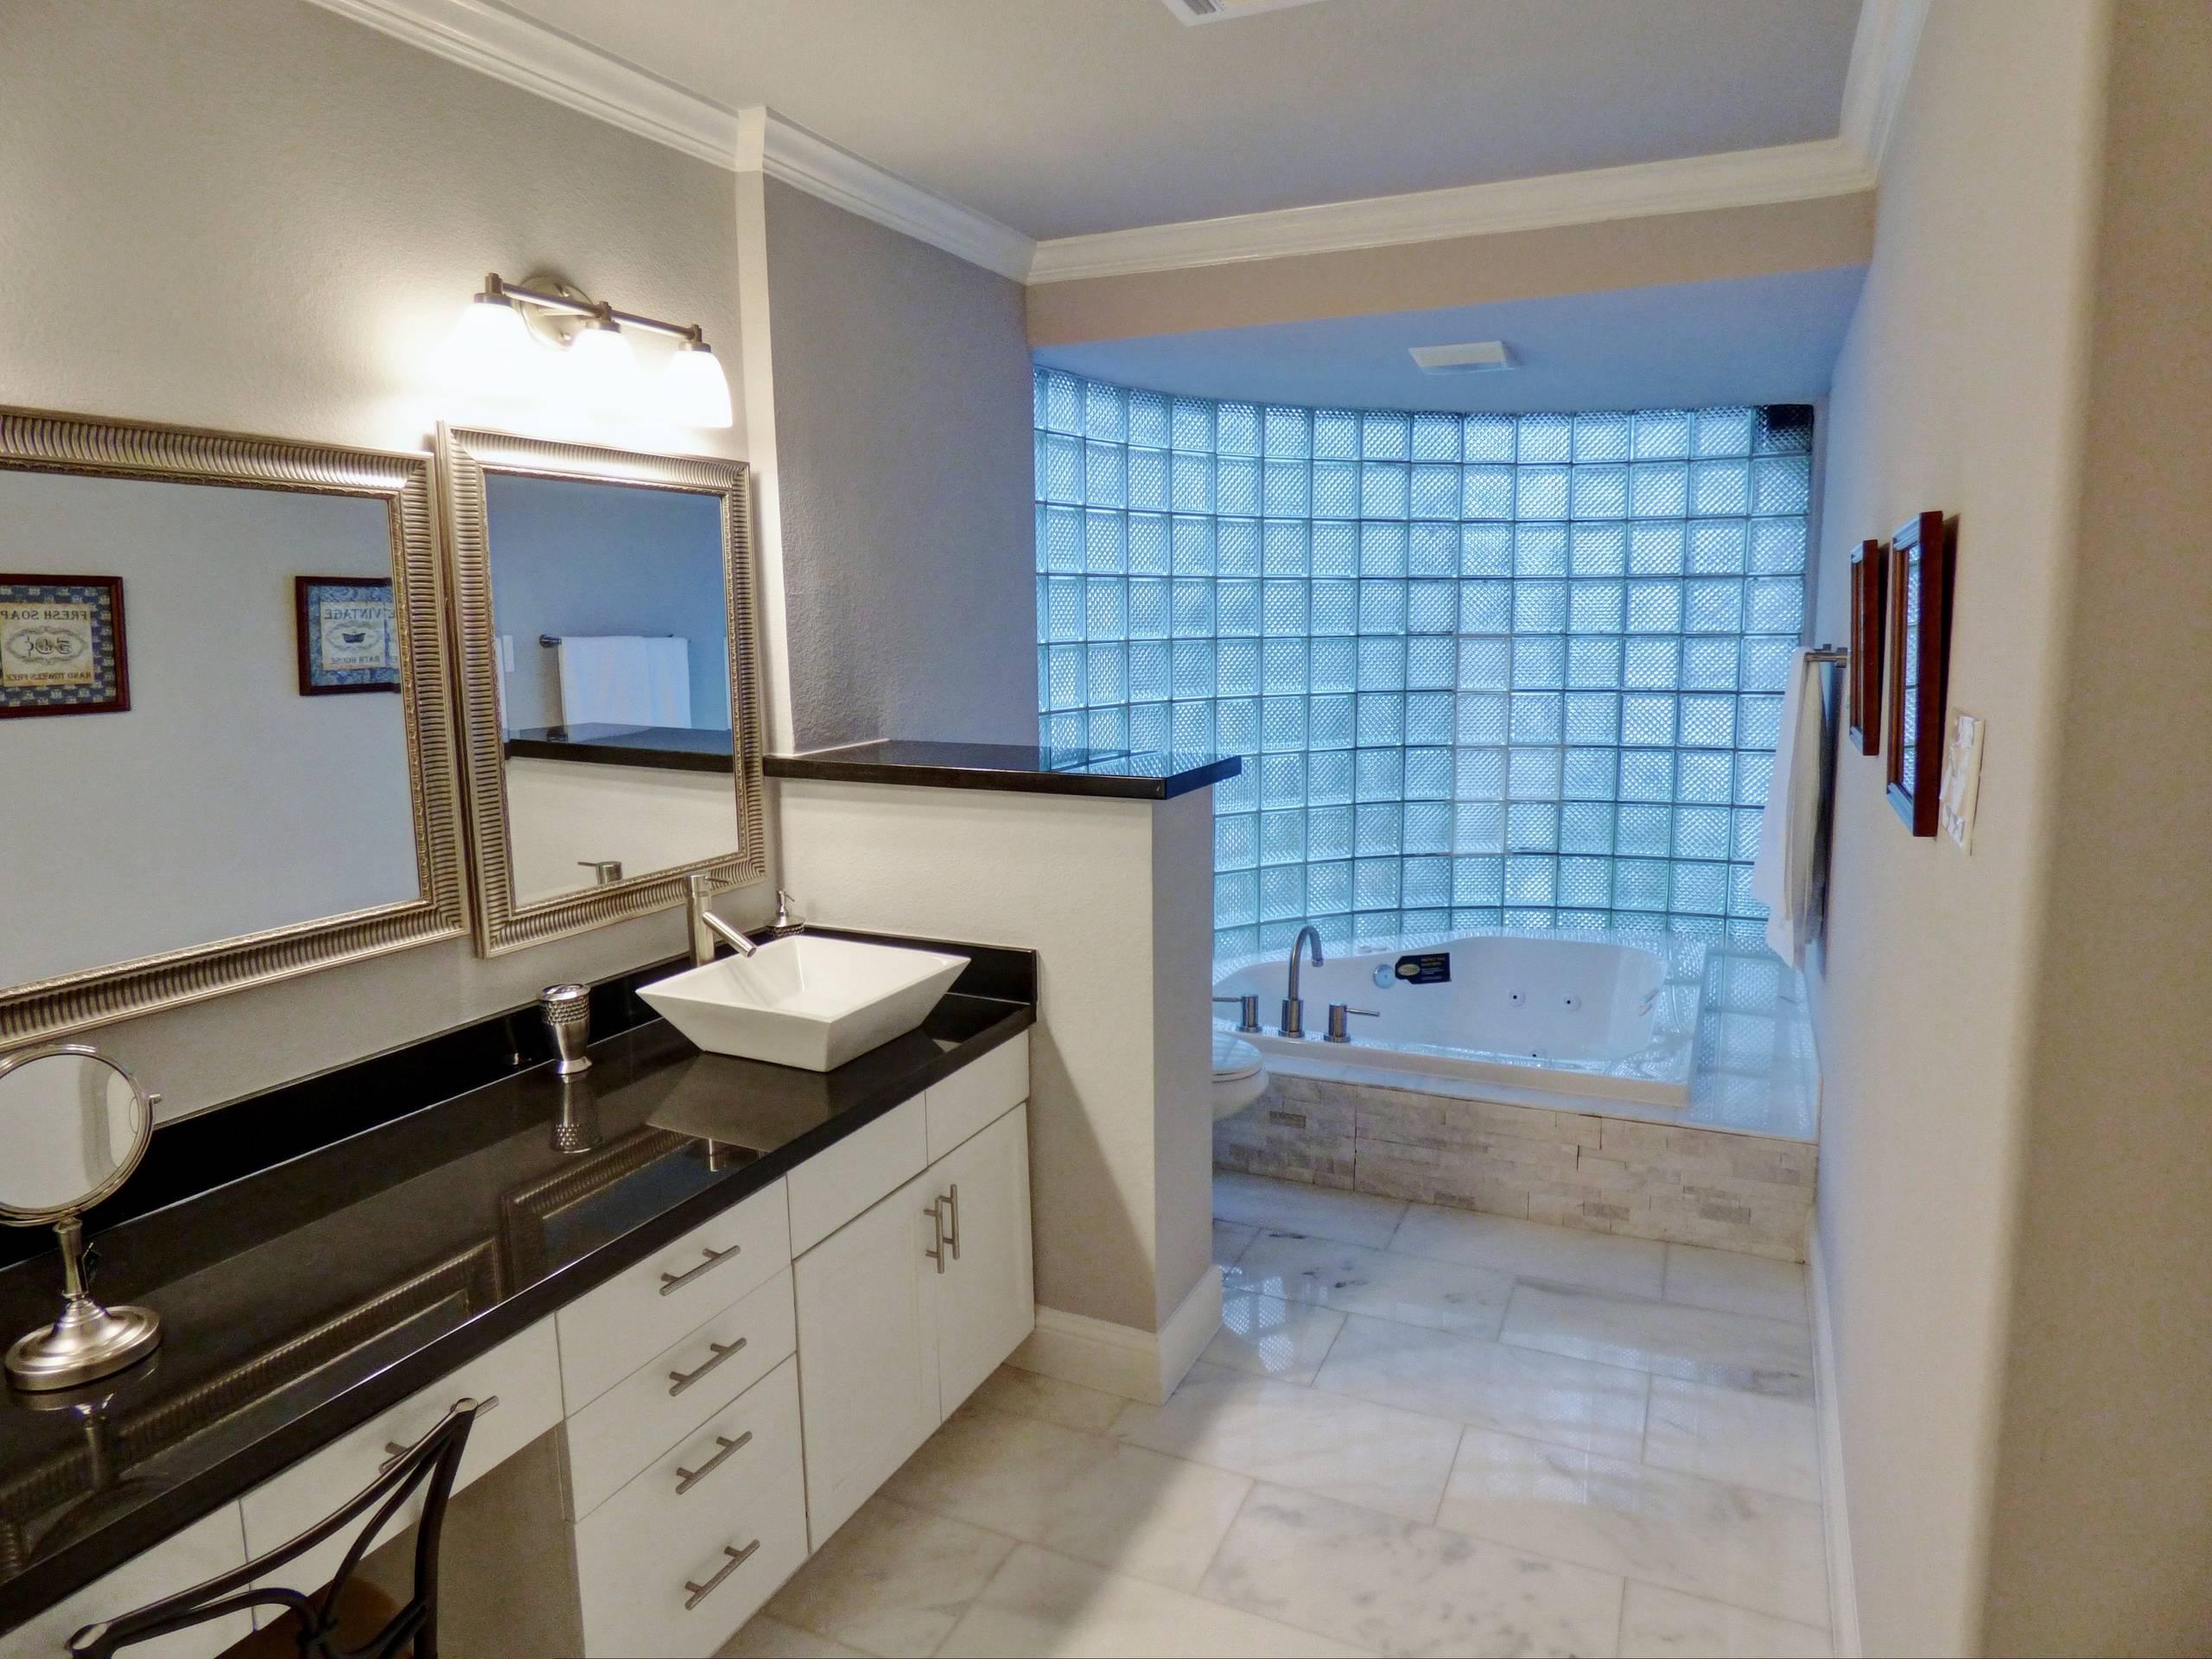 The Oasis of Westbury Ladies Master Bathroom 2